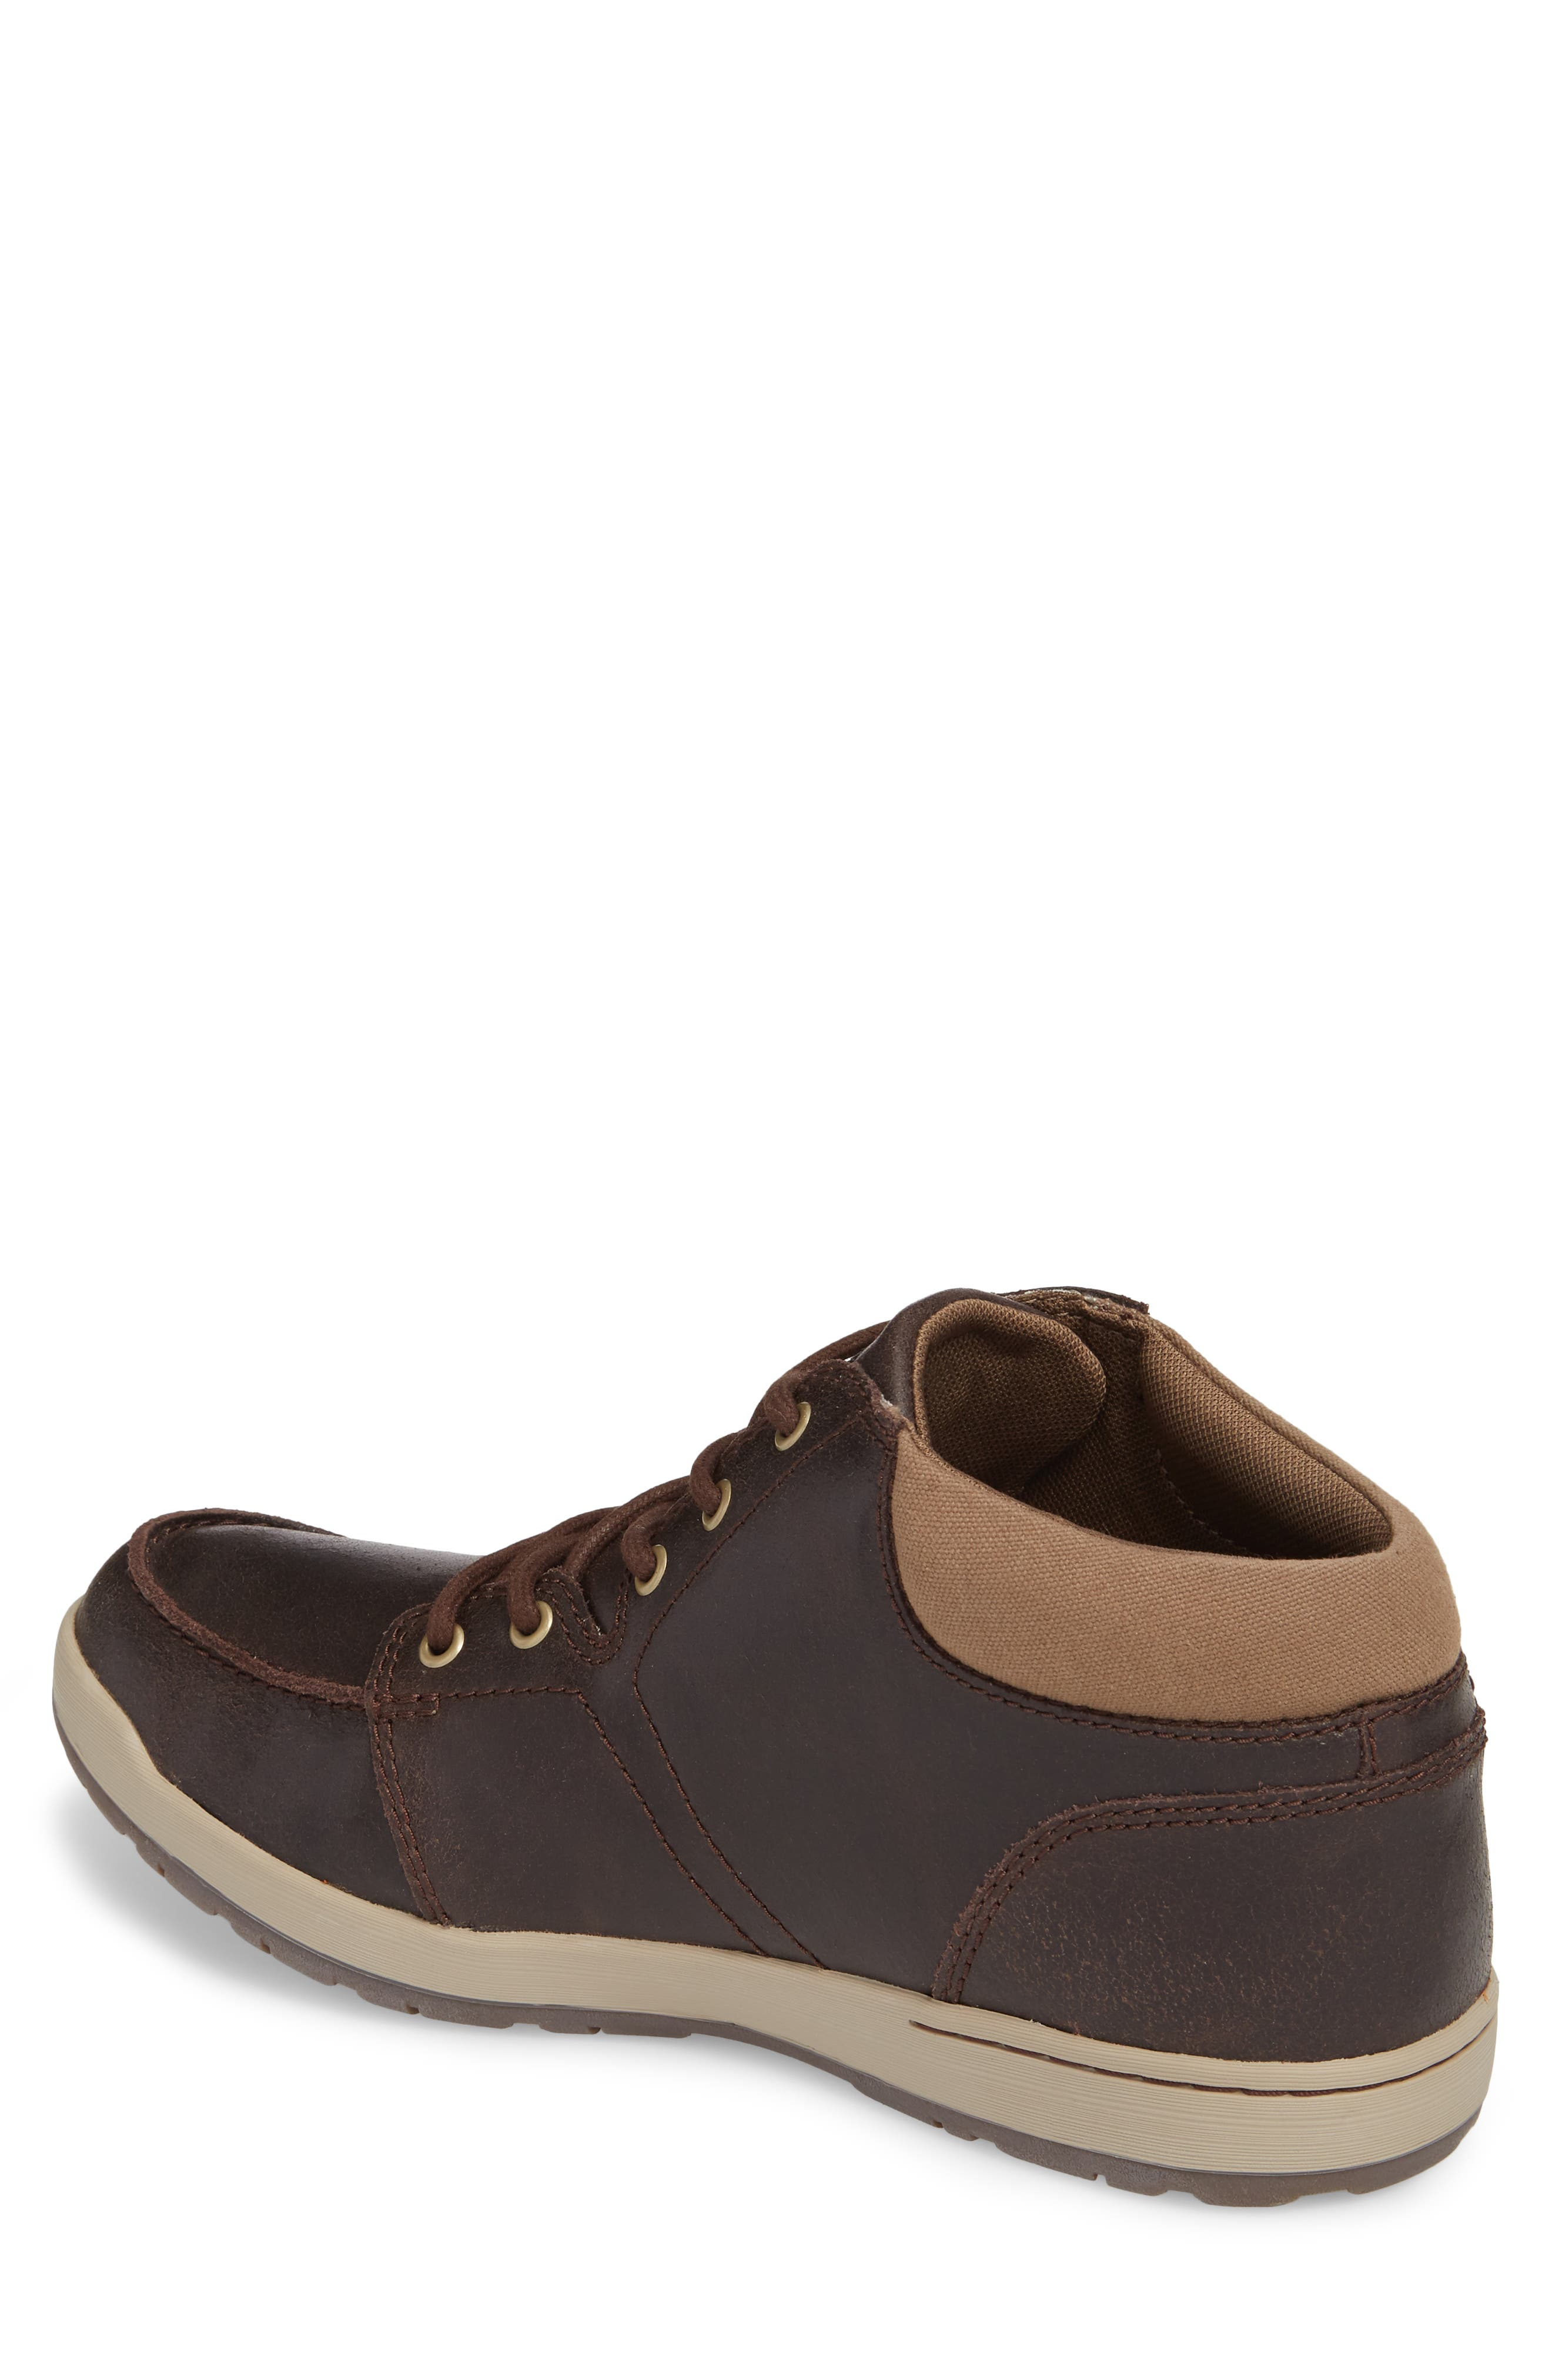 Alternate Image 2  - The North Face Ballard Evo Moc Toe Boot (Men)